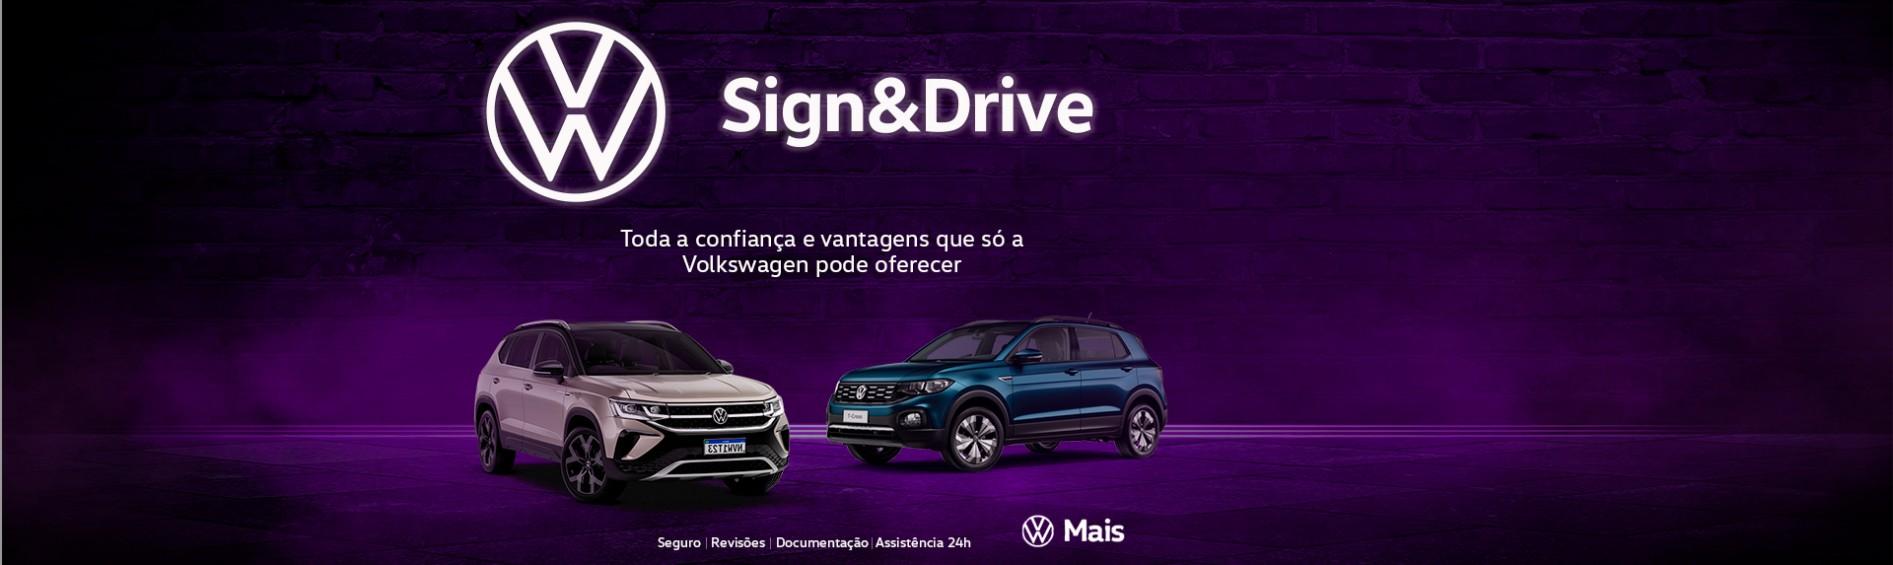 Sing & Drive